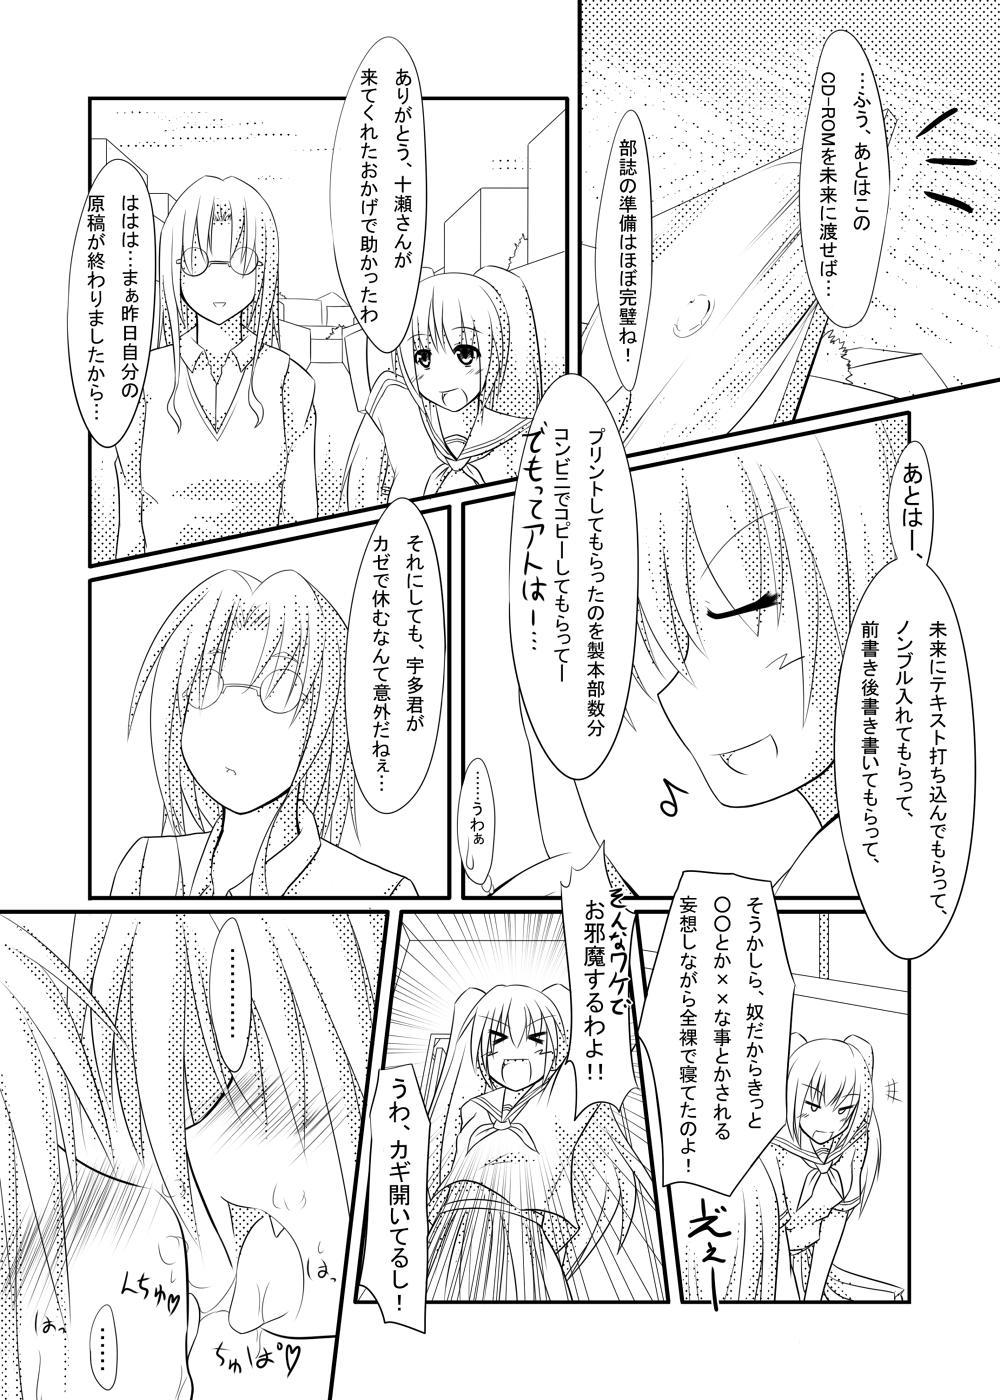 Peaceful☆Revolution 103